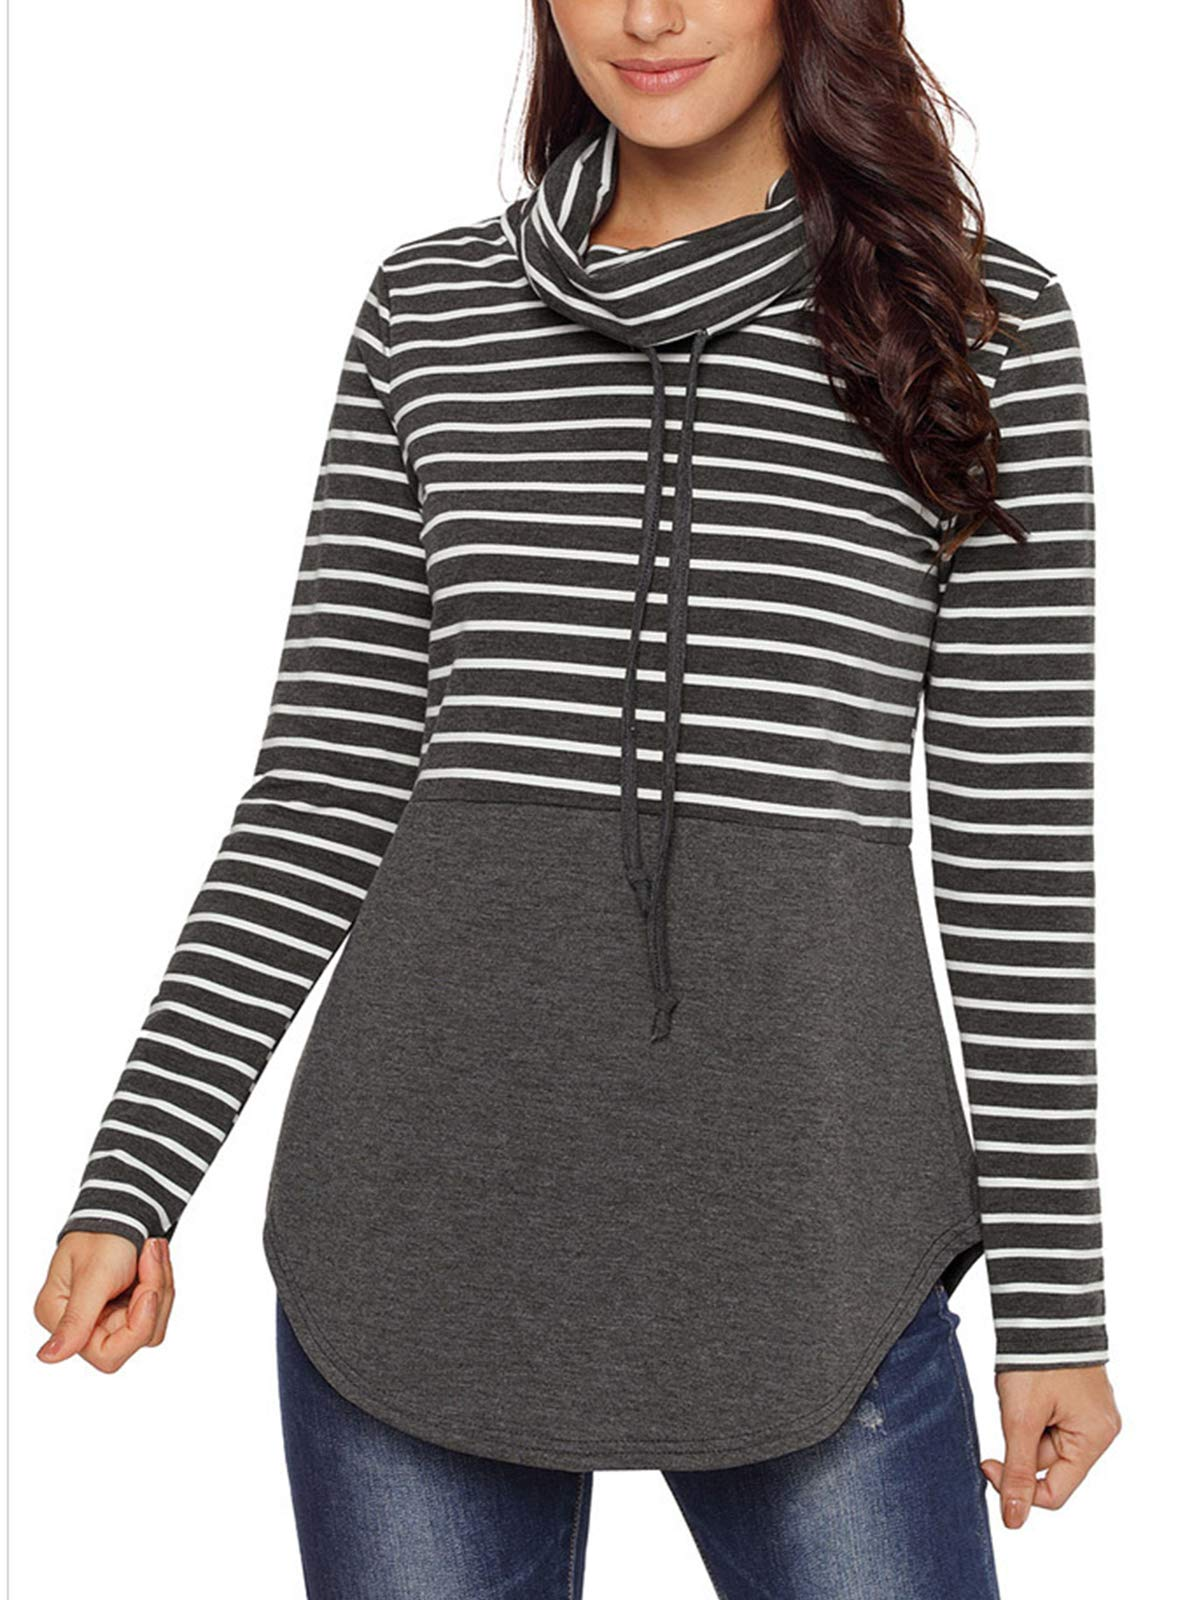 GARYOB Women's Cowl Neck Hoodies Long Sleeve Sweatshirts Color Block Drawstring Tops Lightweight Casual Pullover